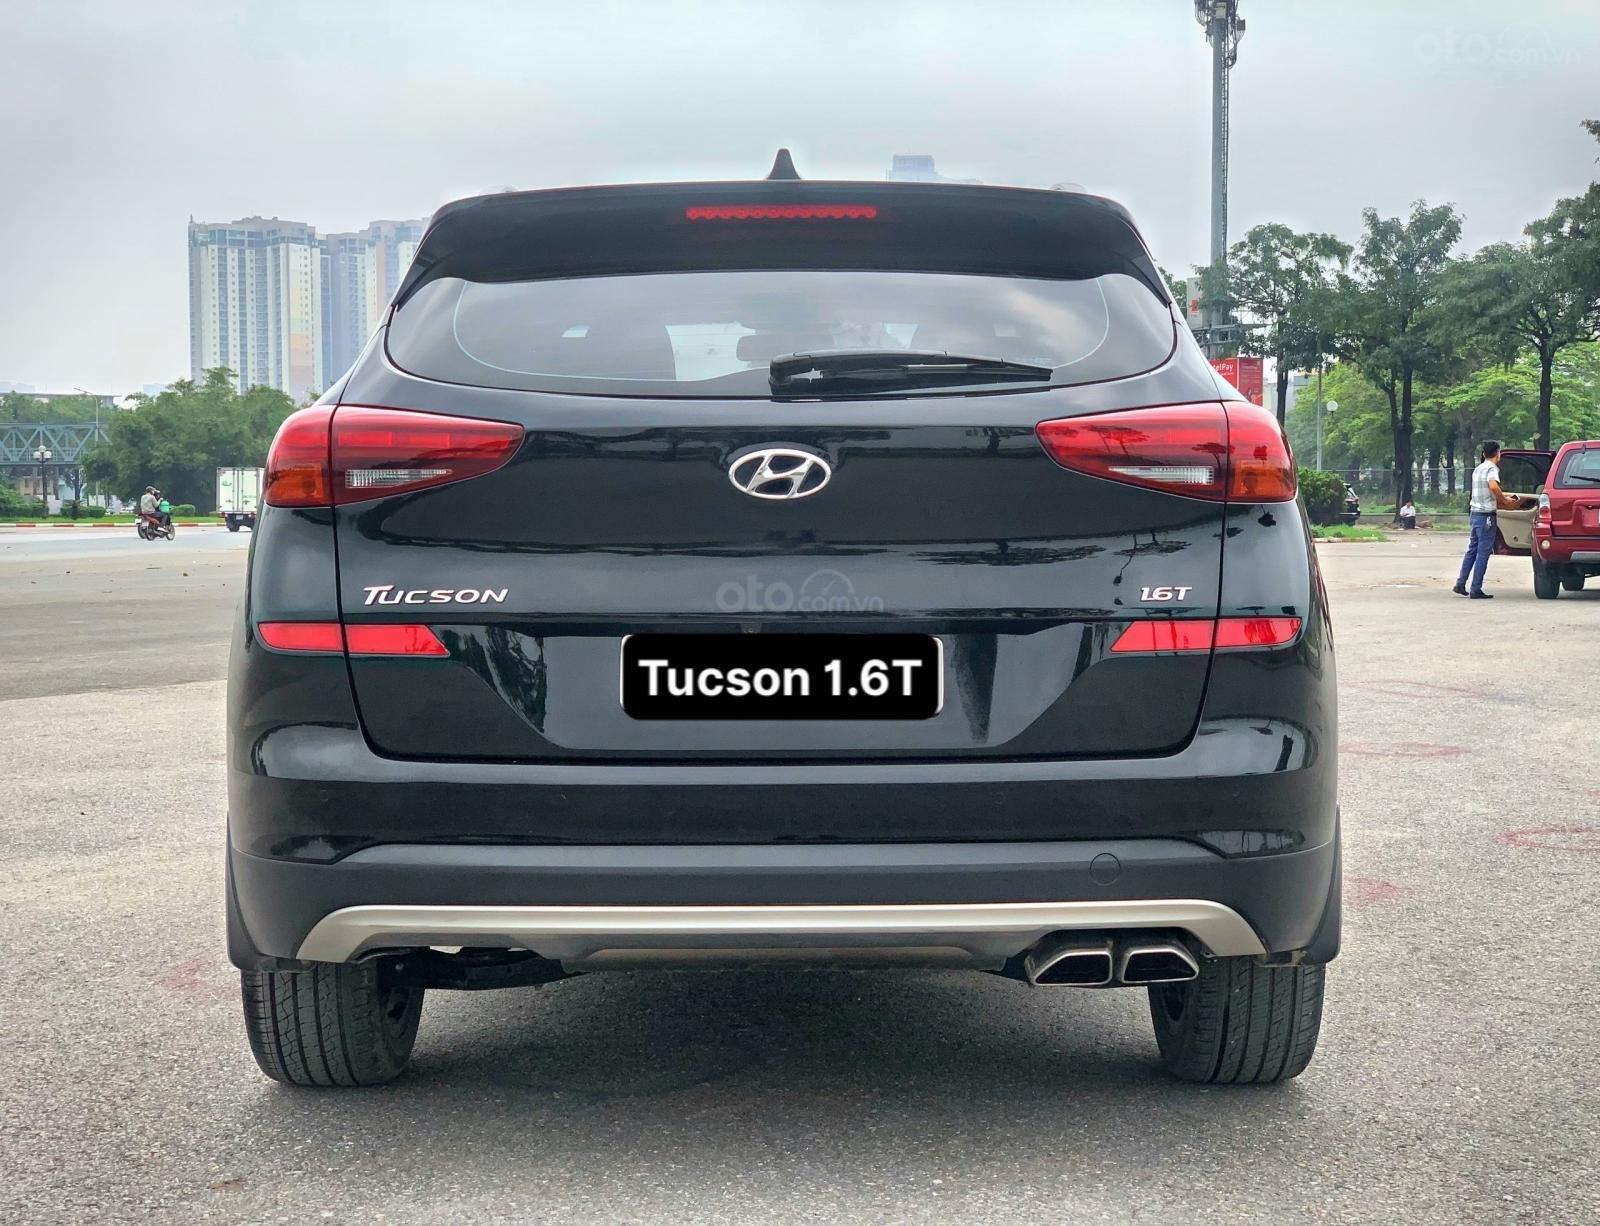 Cần bán gấp Hyundai Tucson 1.6 Turbo sx năm 2019, 878 triệu (5)